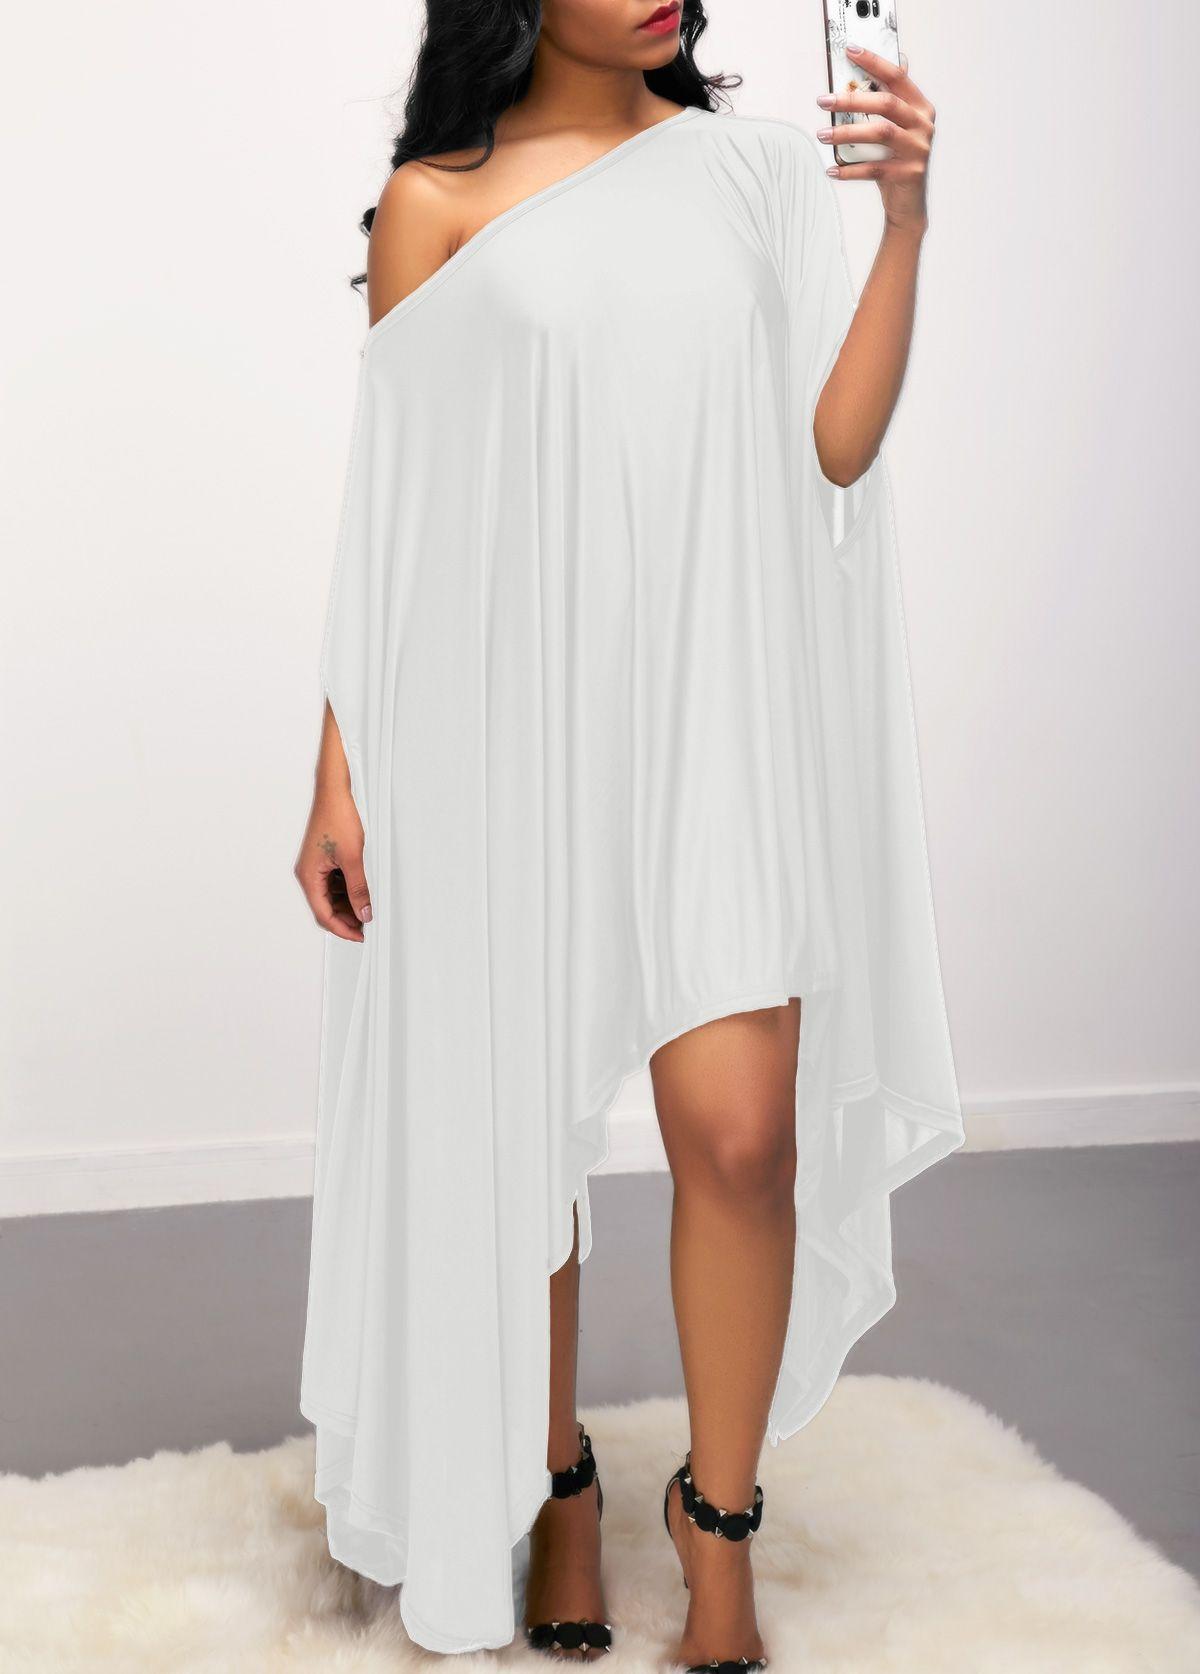 White Skew Neck Asymmetric Hem Dress | Rosewe.com - USD $27.12 | All ...